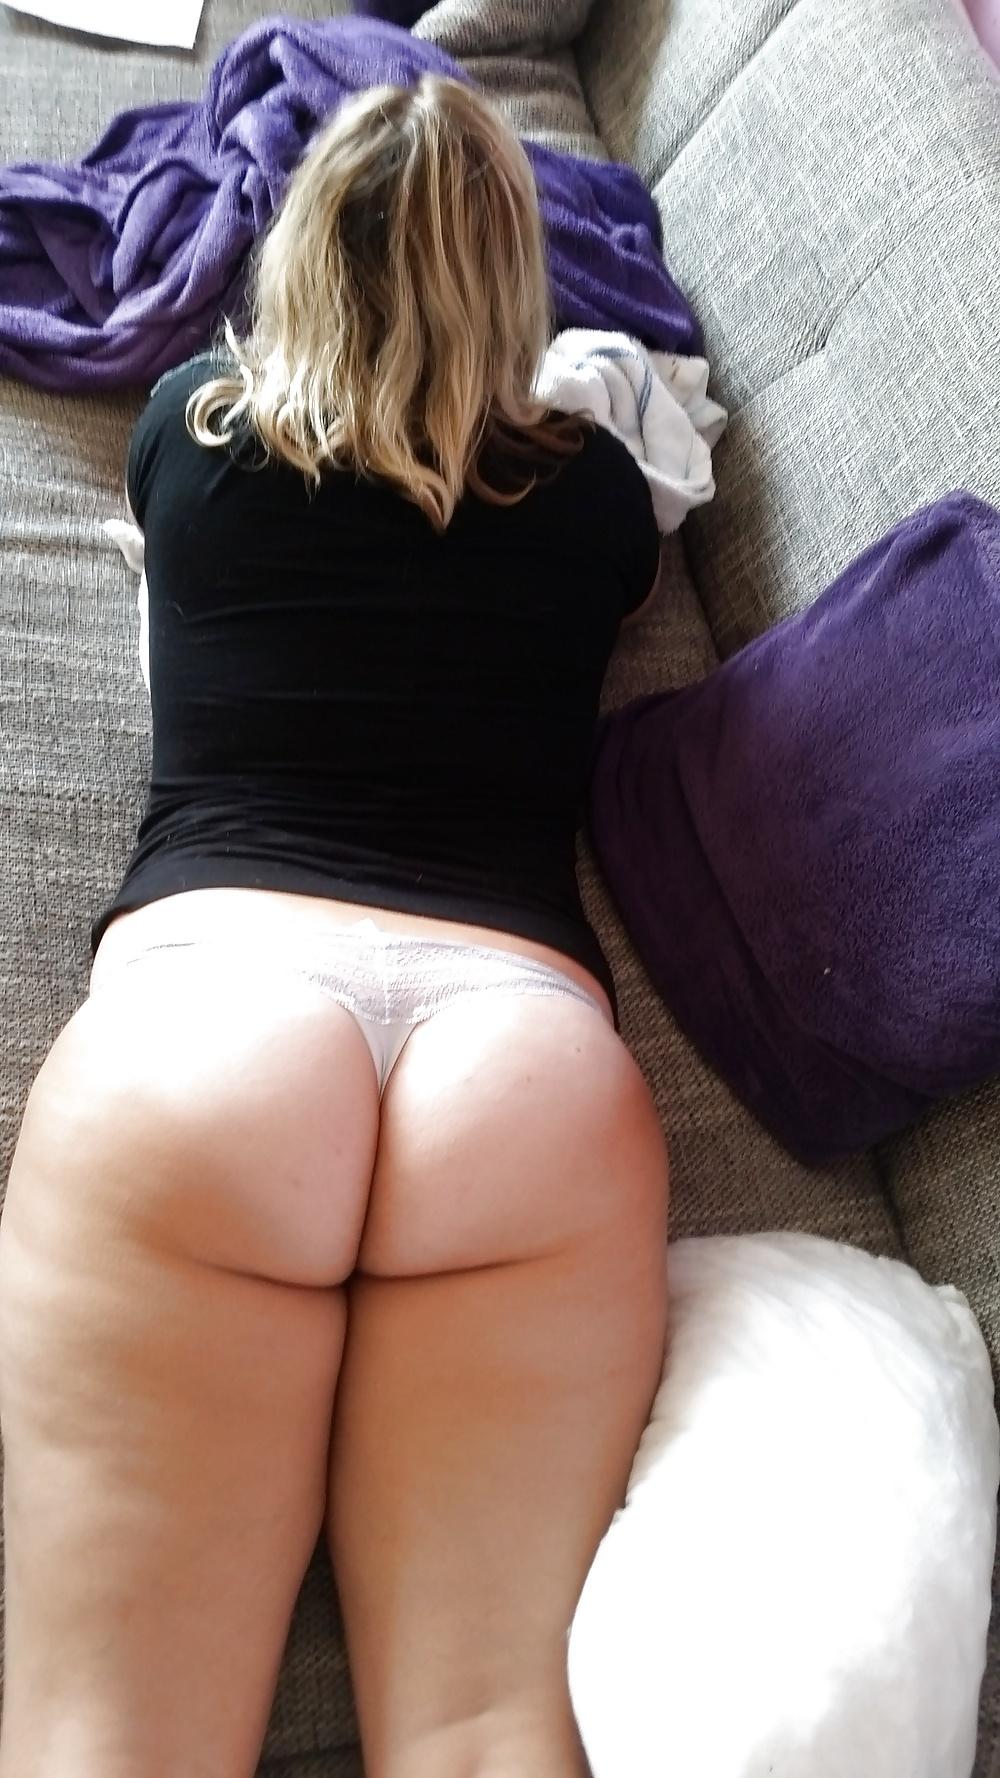 Joanie laurer nude playboy pics